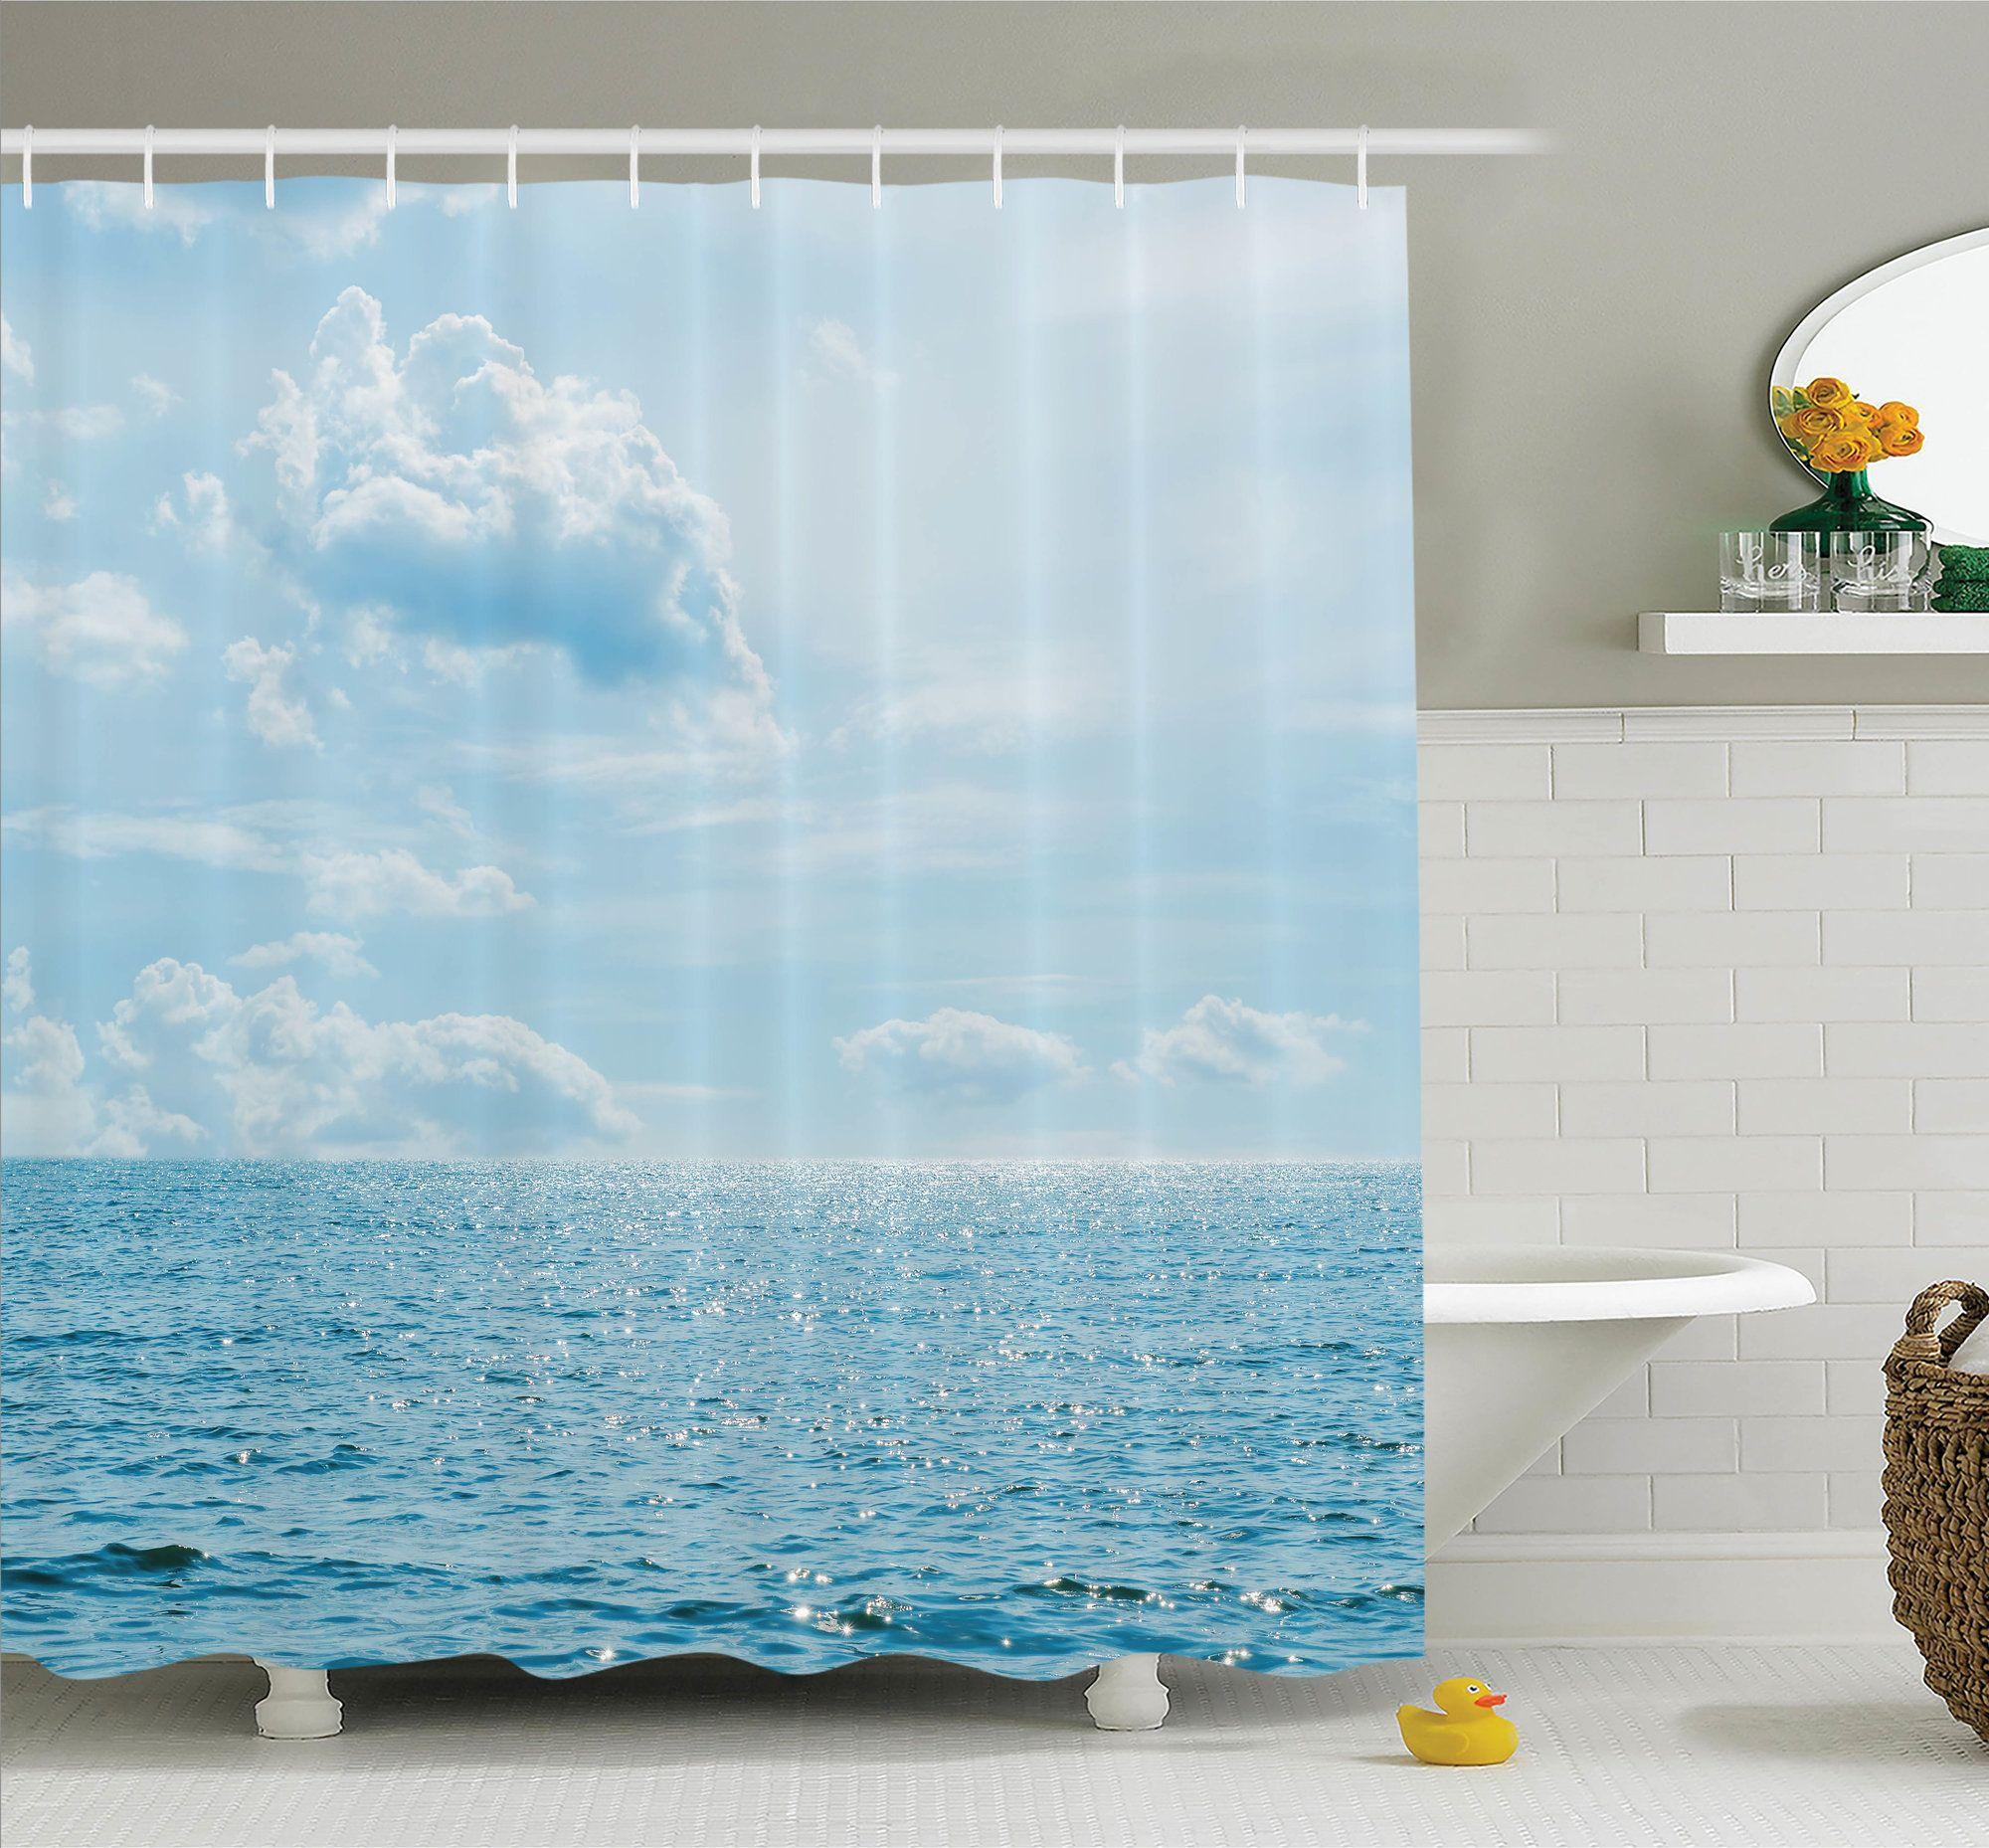 Nautical Calm Sea Paradise Shower Curtain Set | Shower curtain sets ...